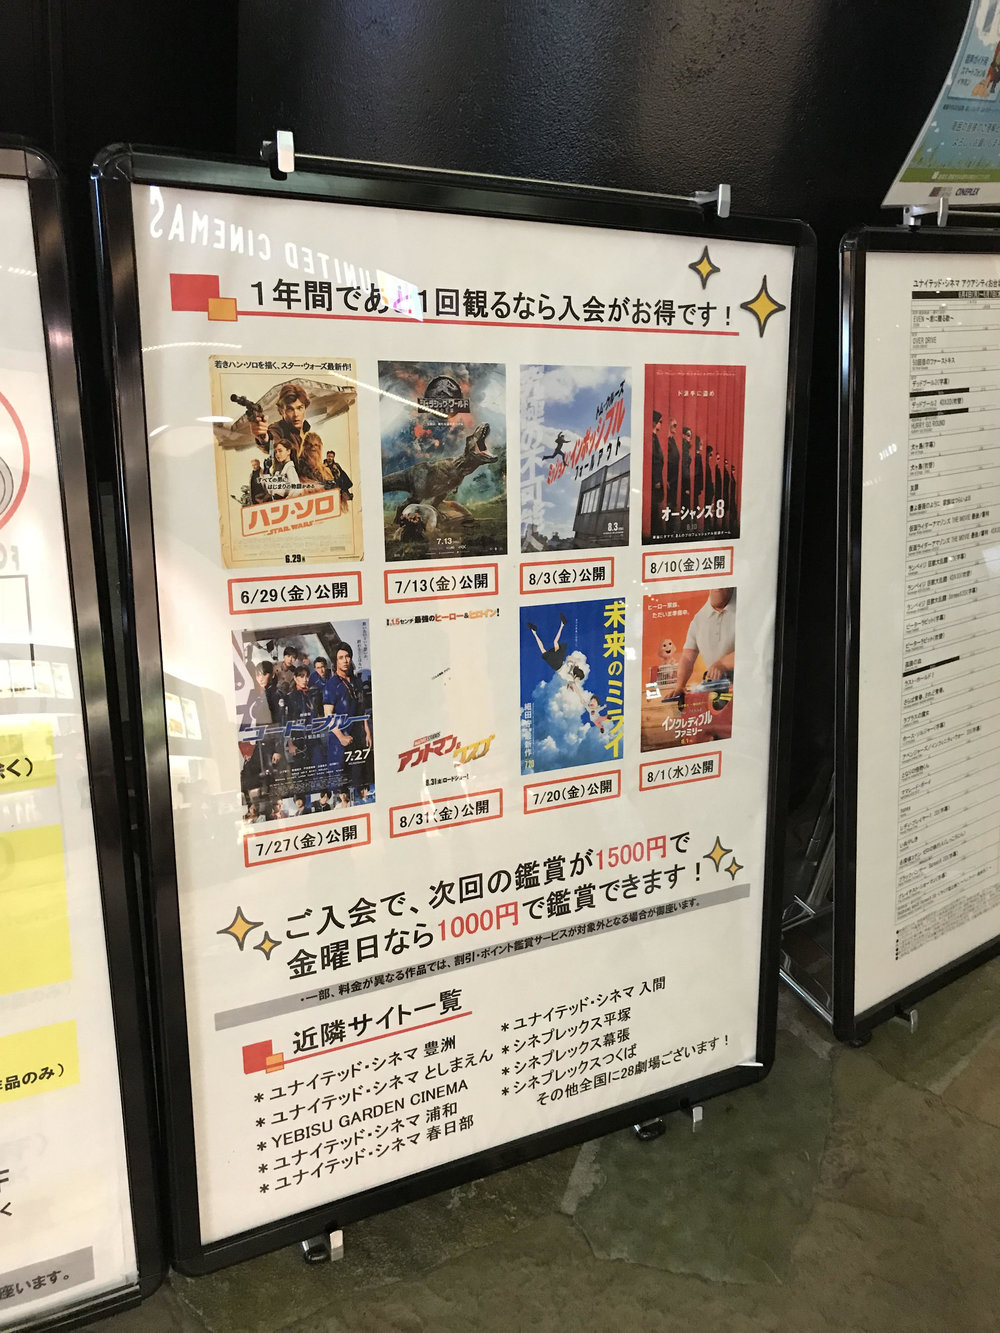 Aqua City Mall United Cinemas - Odaiba, Japan - Photo Credit: Martin Thurn